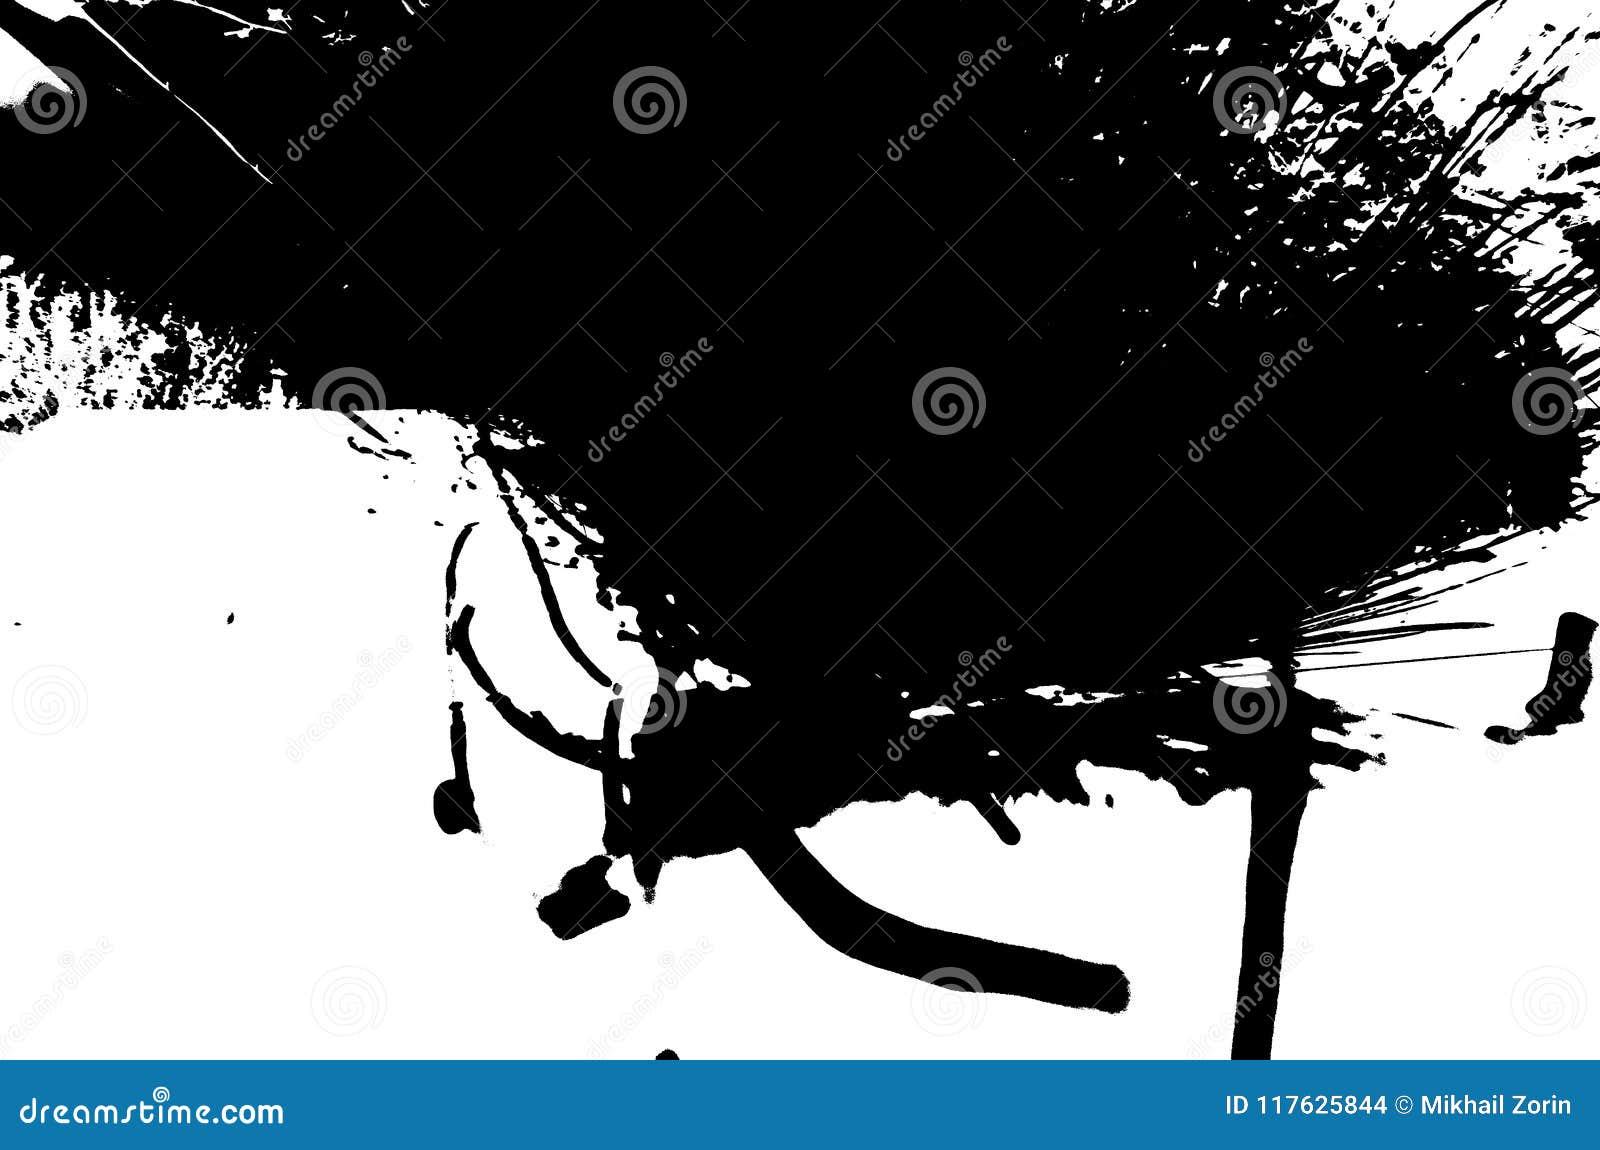 Inkblot van fotororschach test